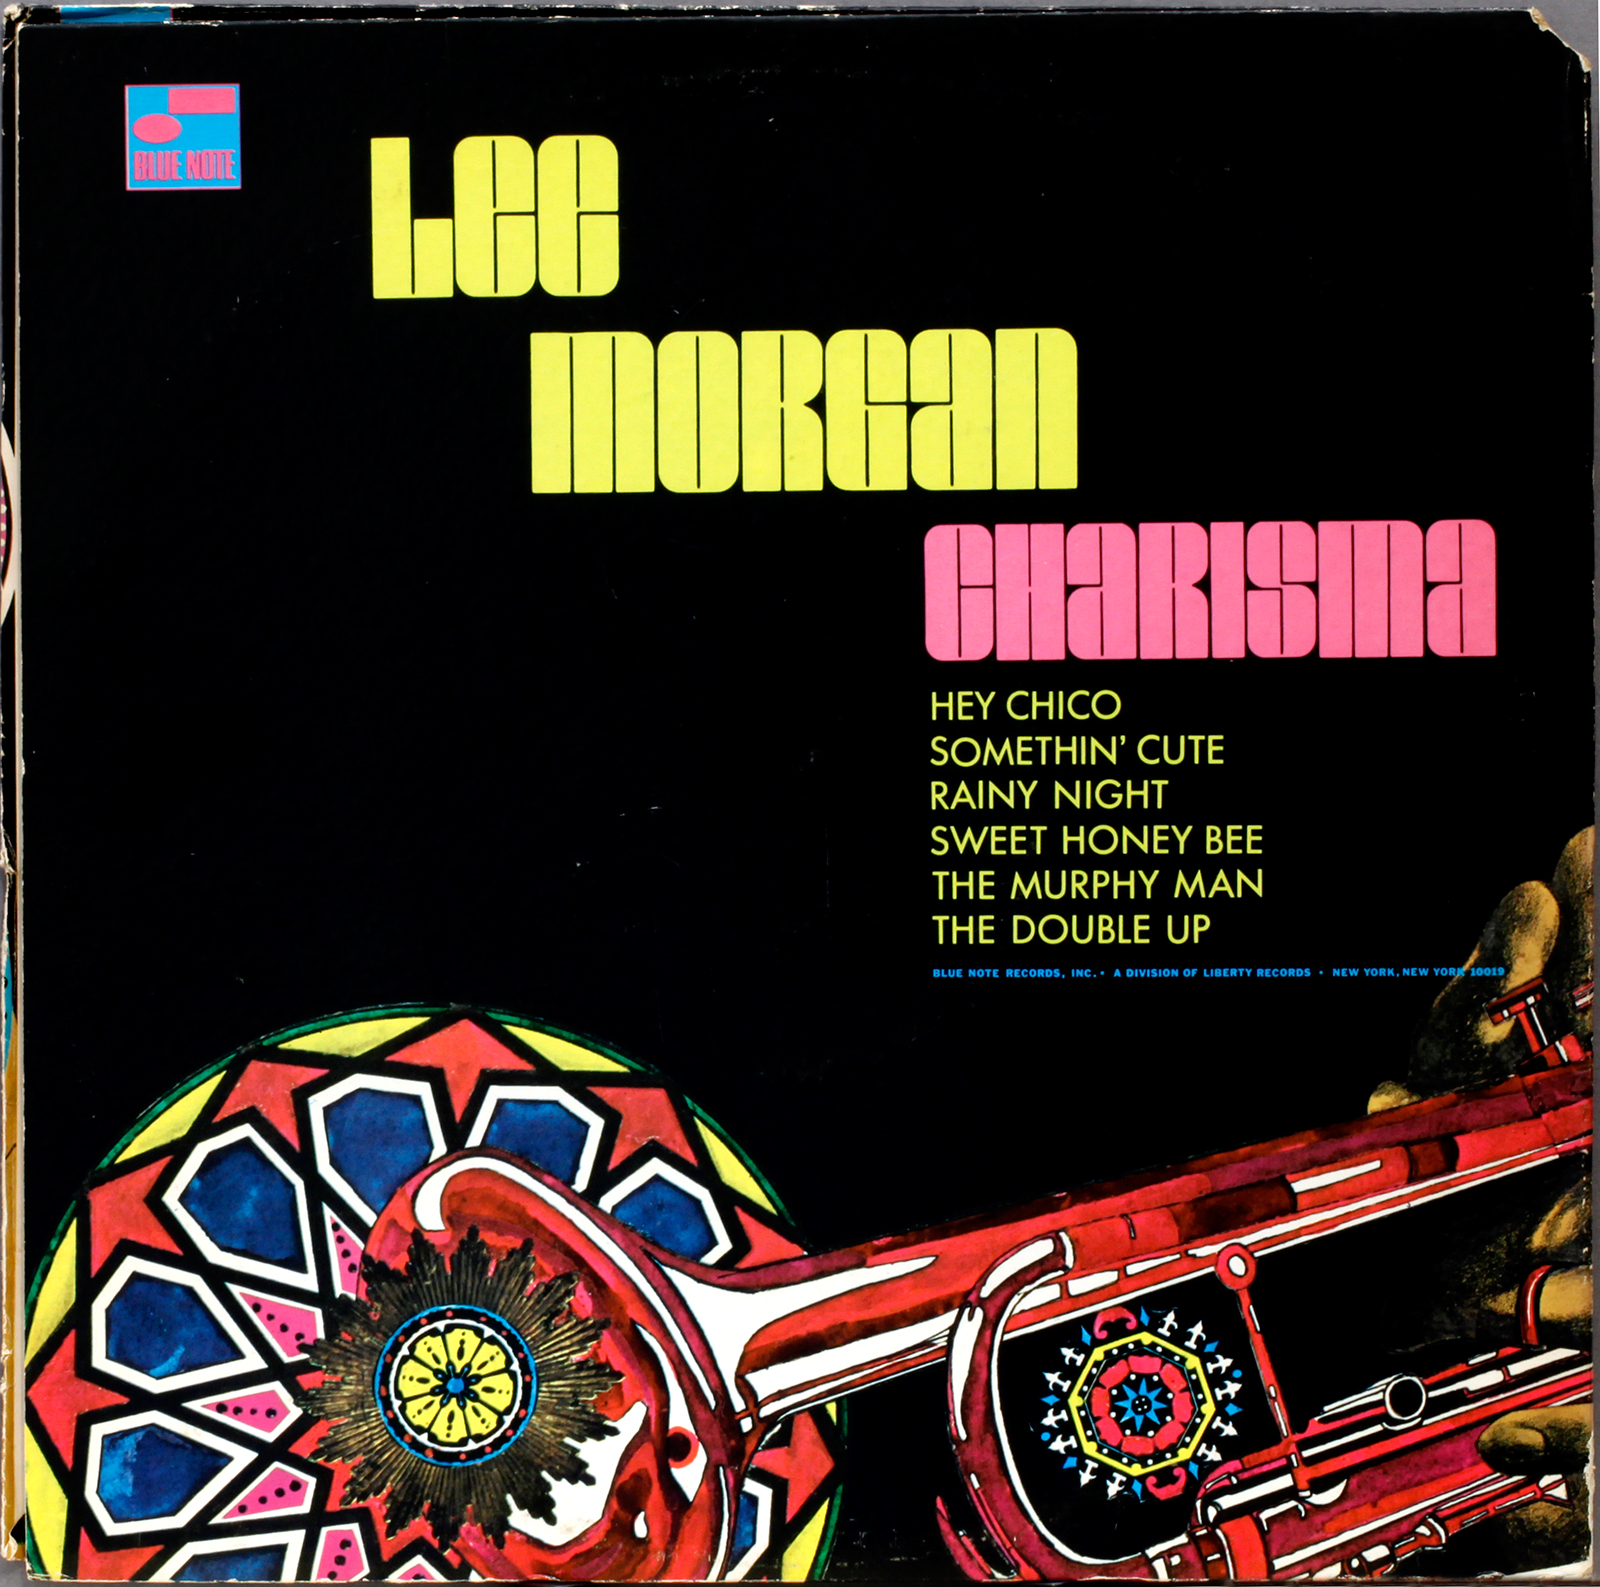 Lee Morgan Charisma